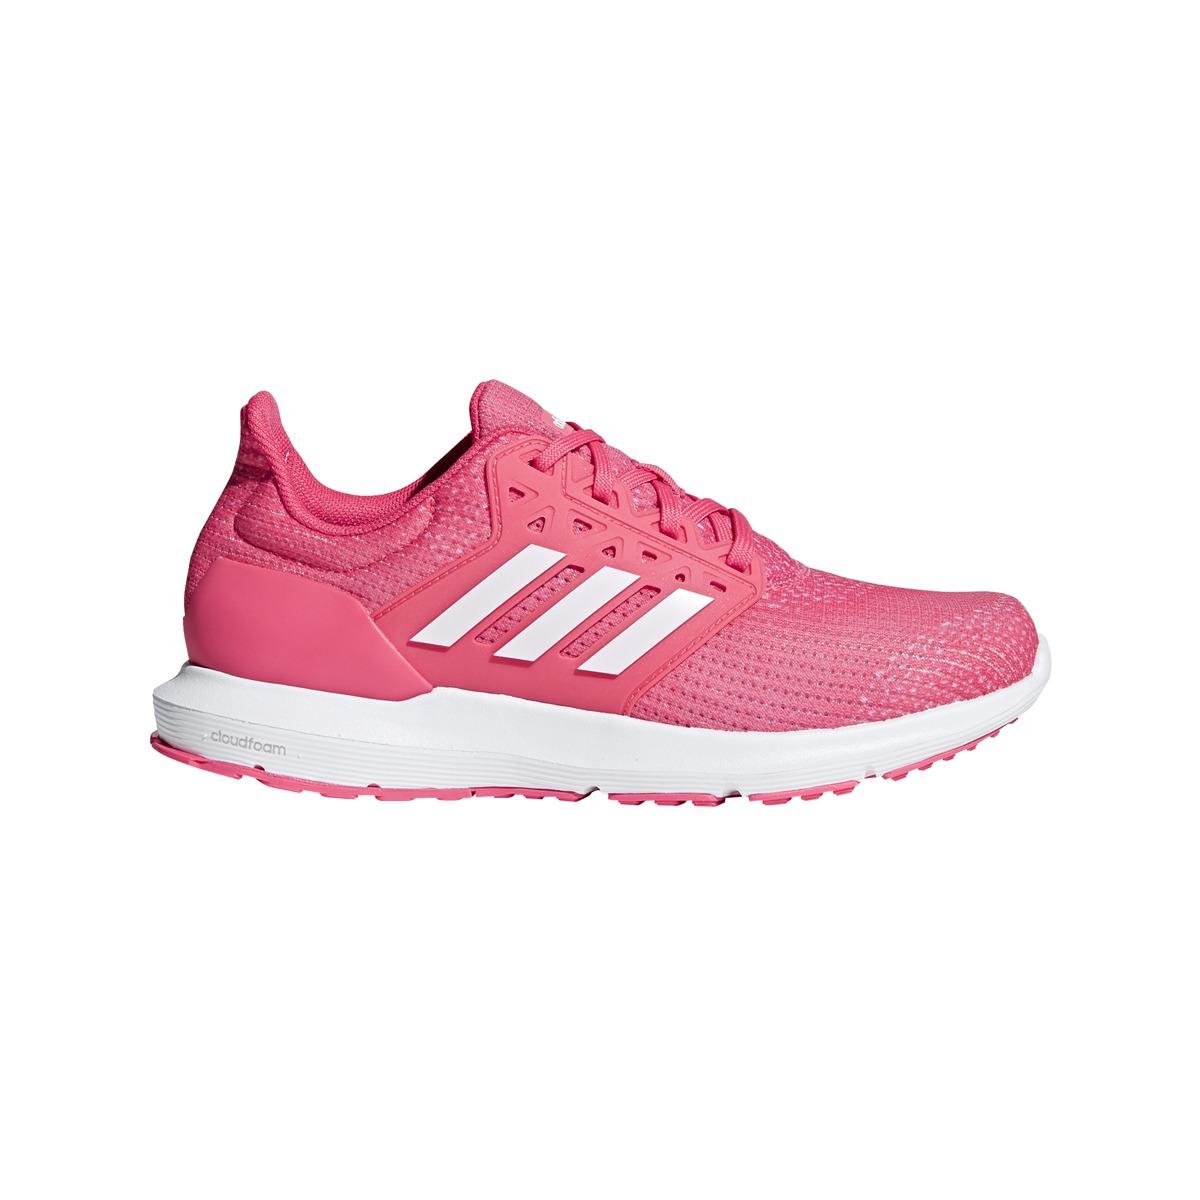 wholesale dealer c322a 33e0d Zapatillas adidas Running Solyx W Mujer Fu bl -   2.049,00 en ...